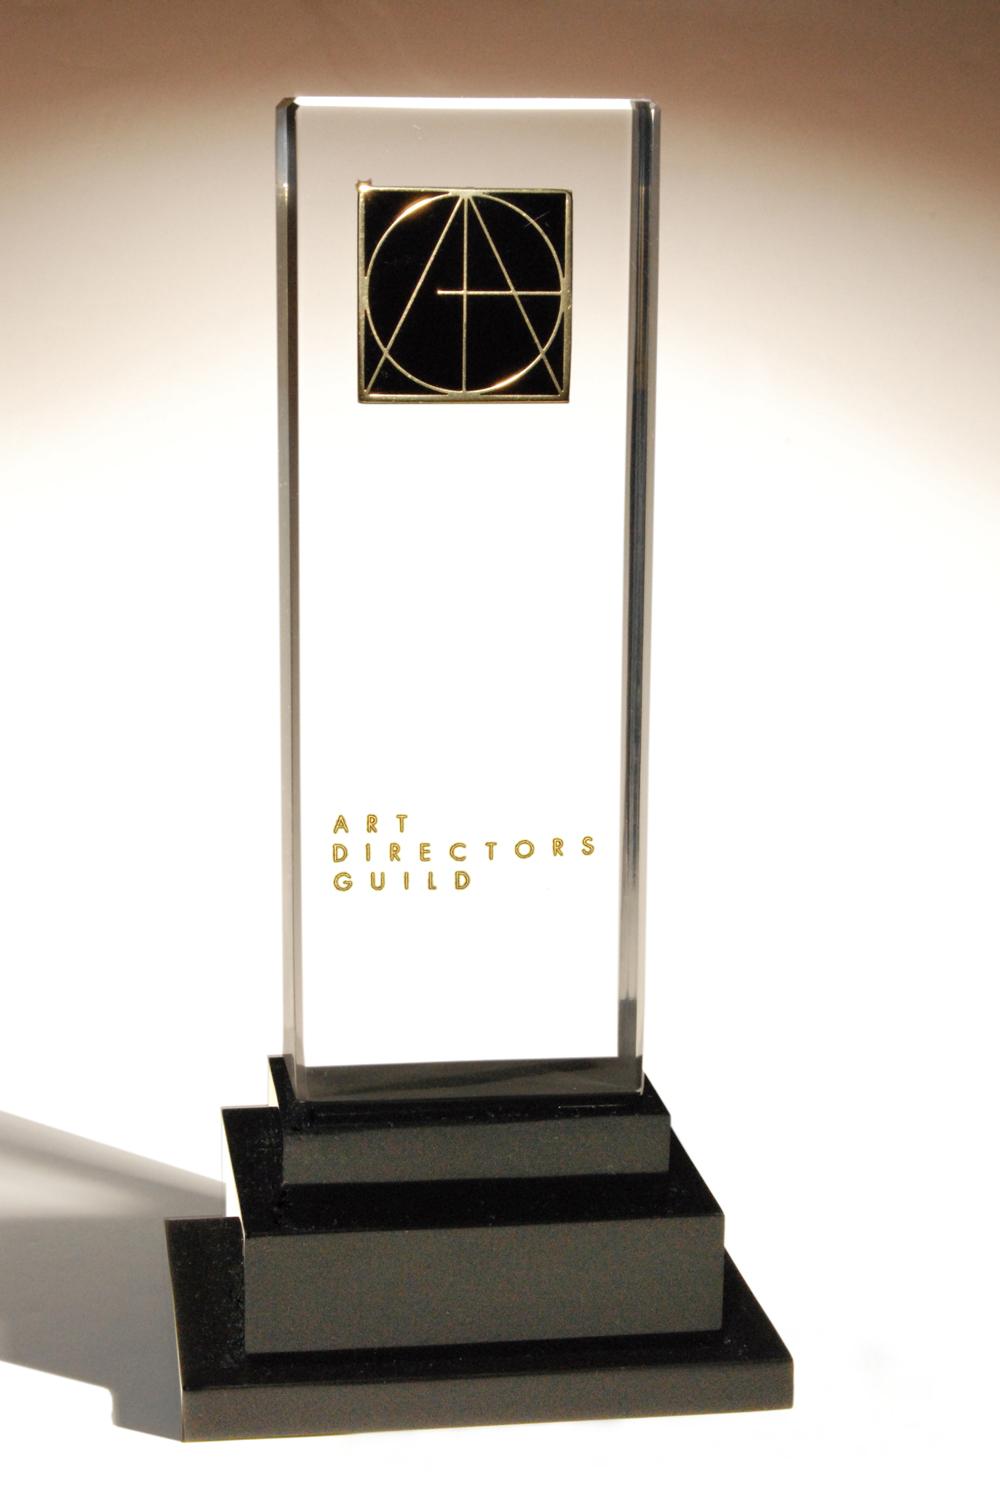 adg excellence in production design award wikipedia. Black Bedroom Furniture Sets. Home Design Ideas